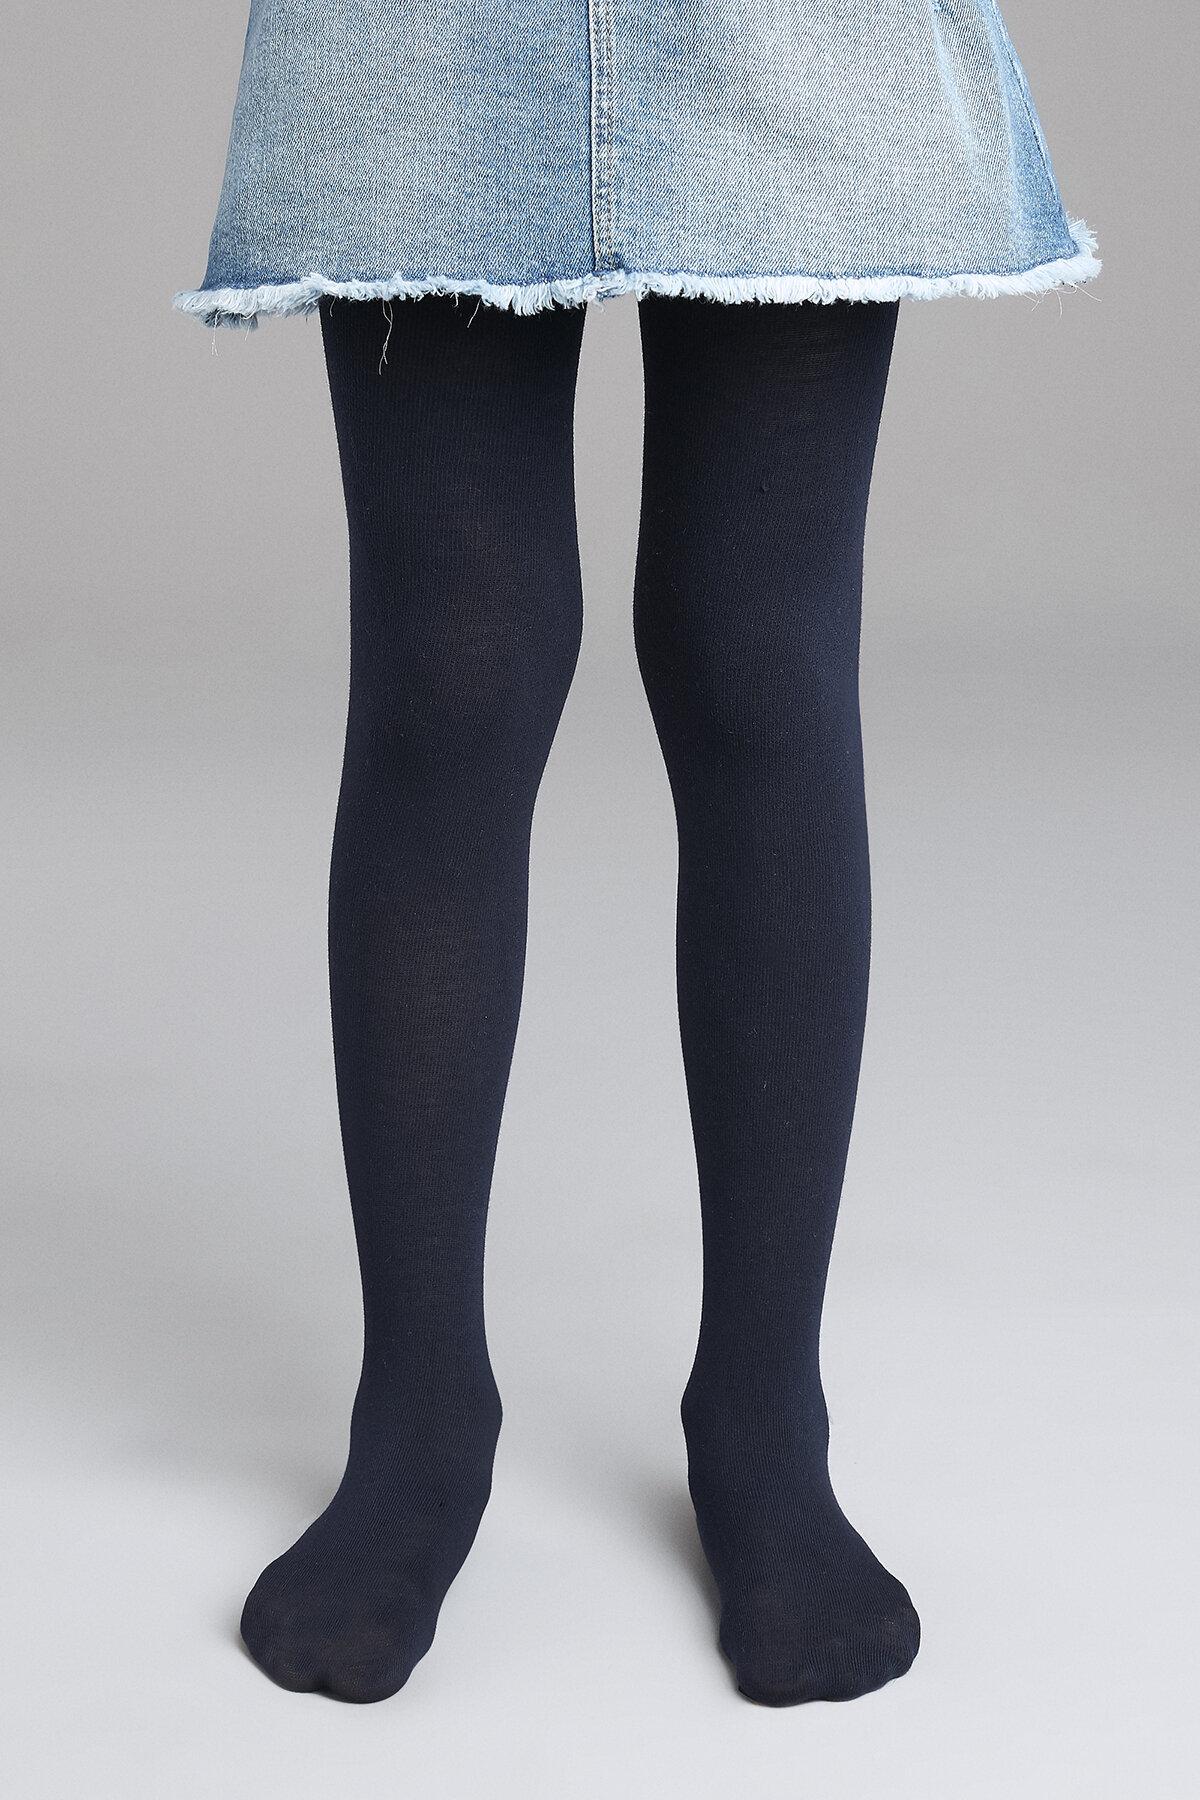 Penti Strumpfhose Extra Baumwolle dunkelblau